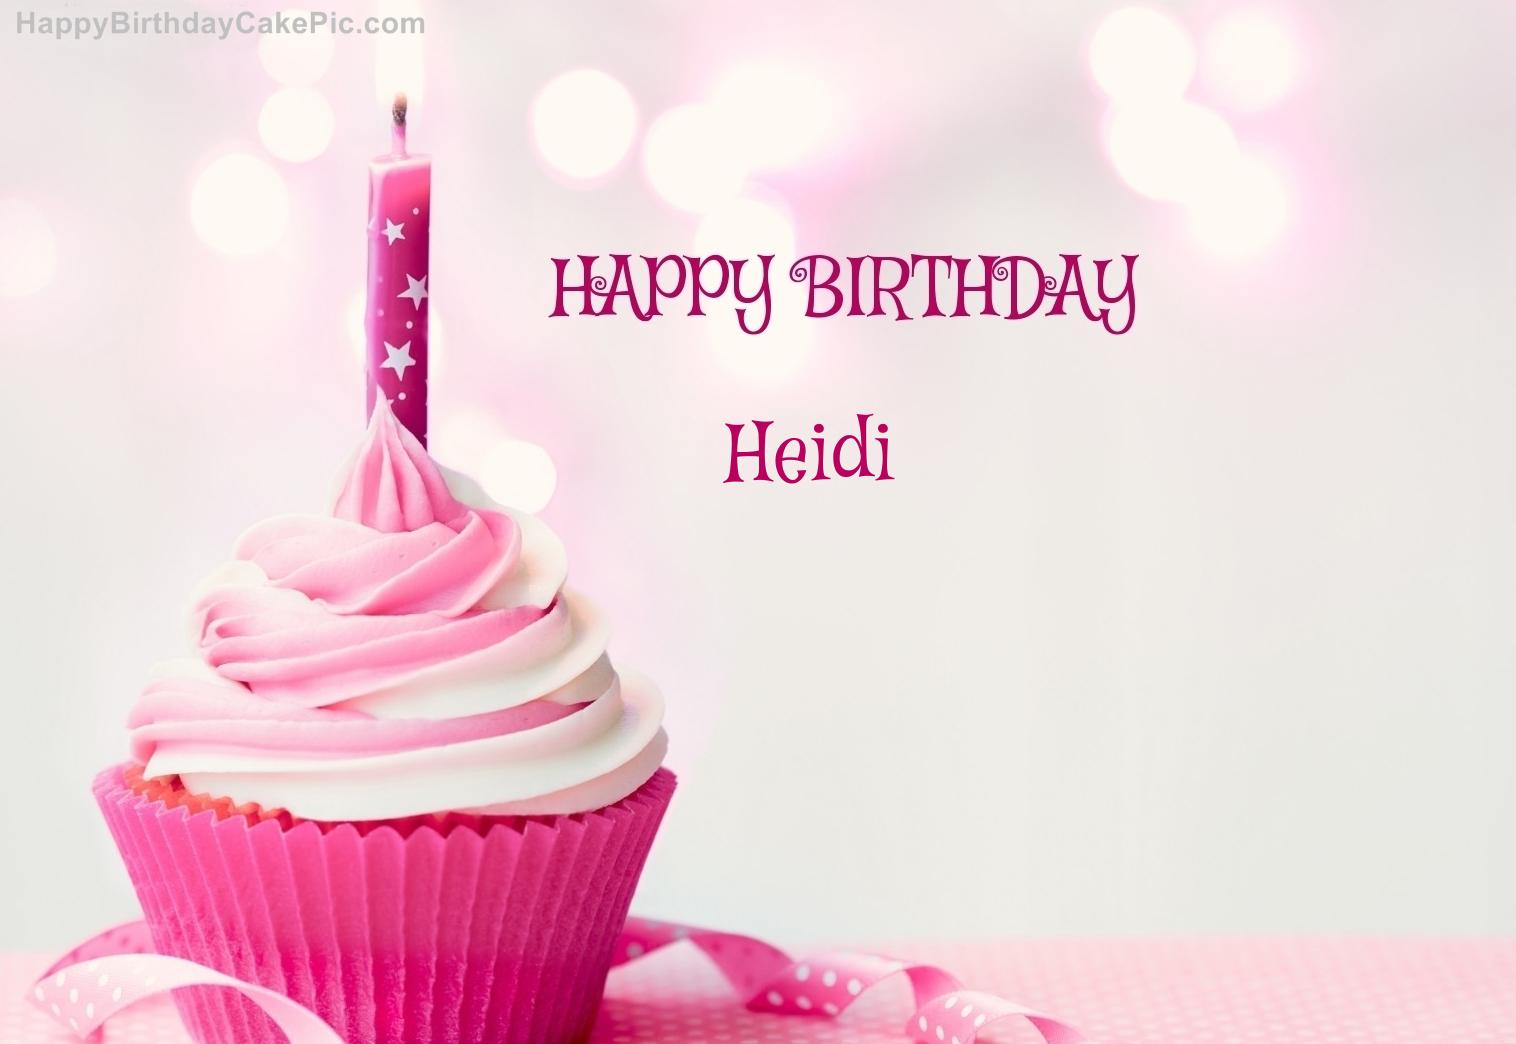 Happy Birthday Cupcake Candle Pink Cake For Heidi